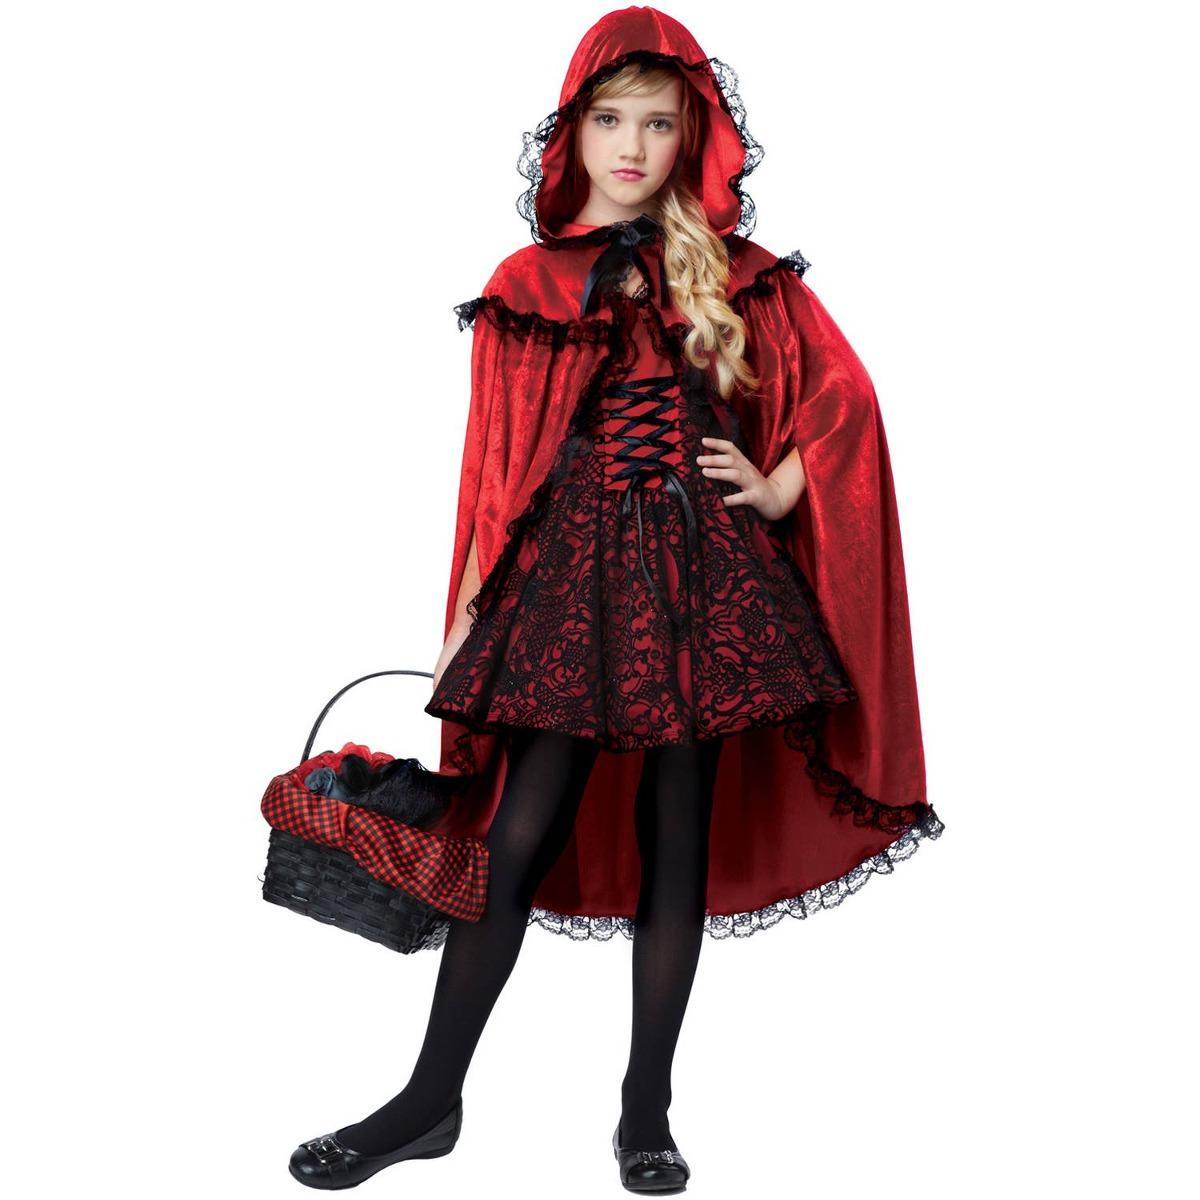 Caperucita Roja Halloween.Disfraz De Caperucita Roja De Halloween Para Nina